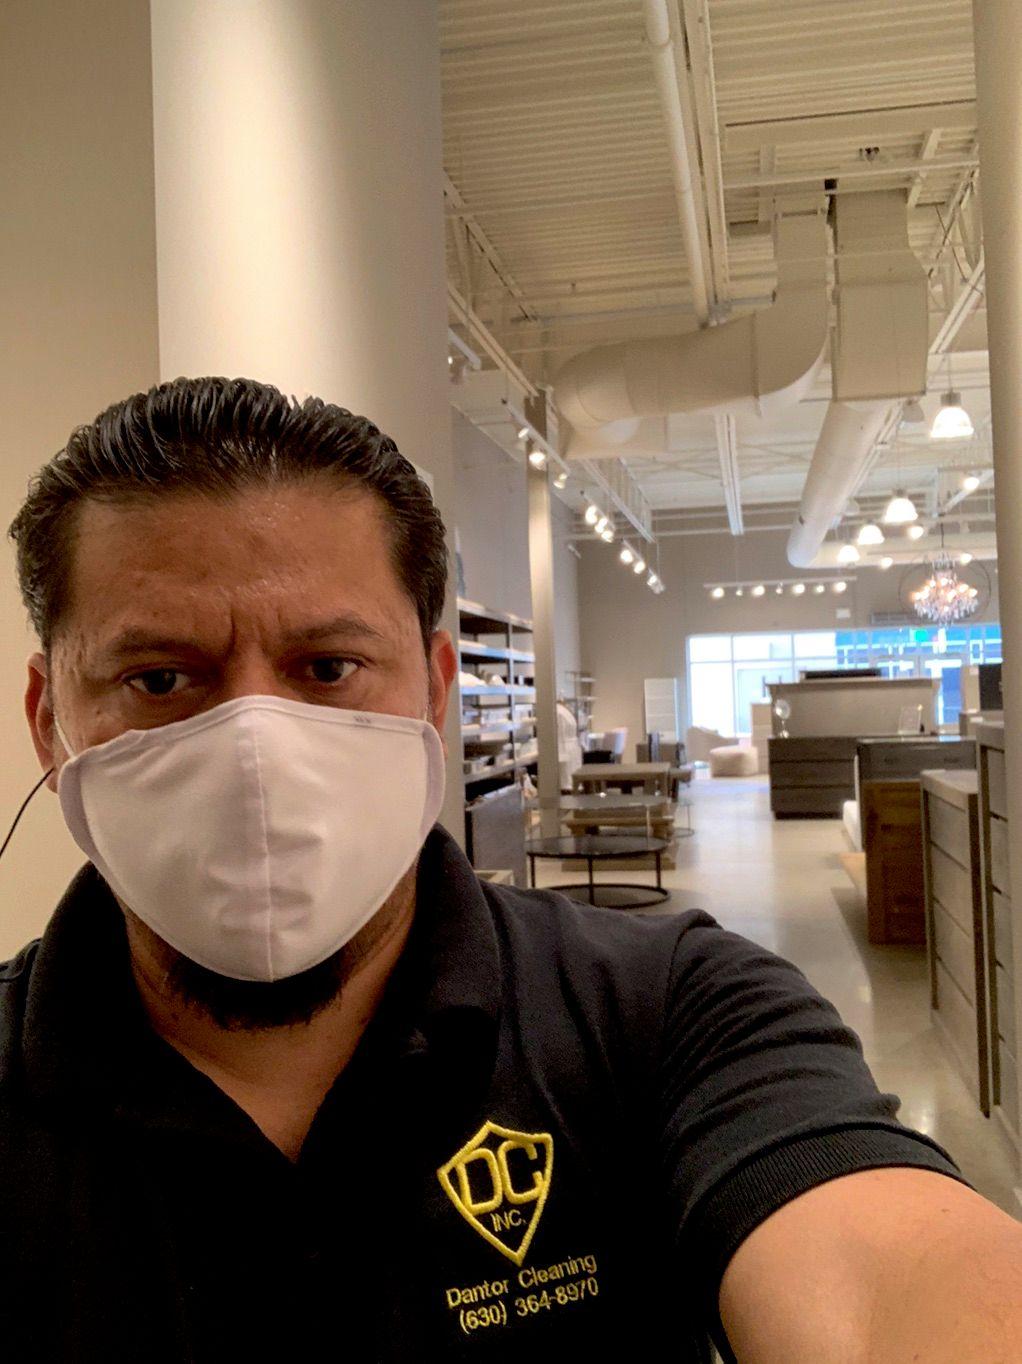 Dantor Cleaning Inc.